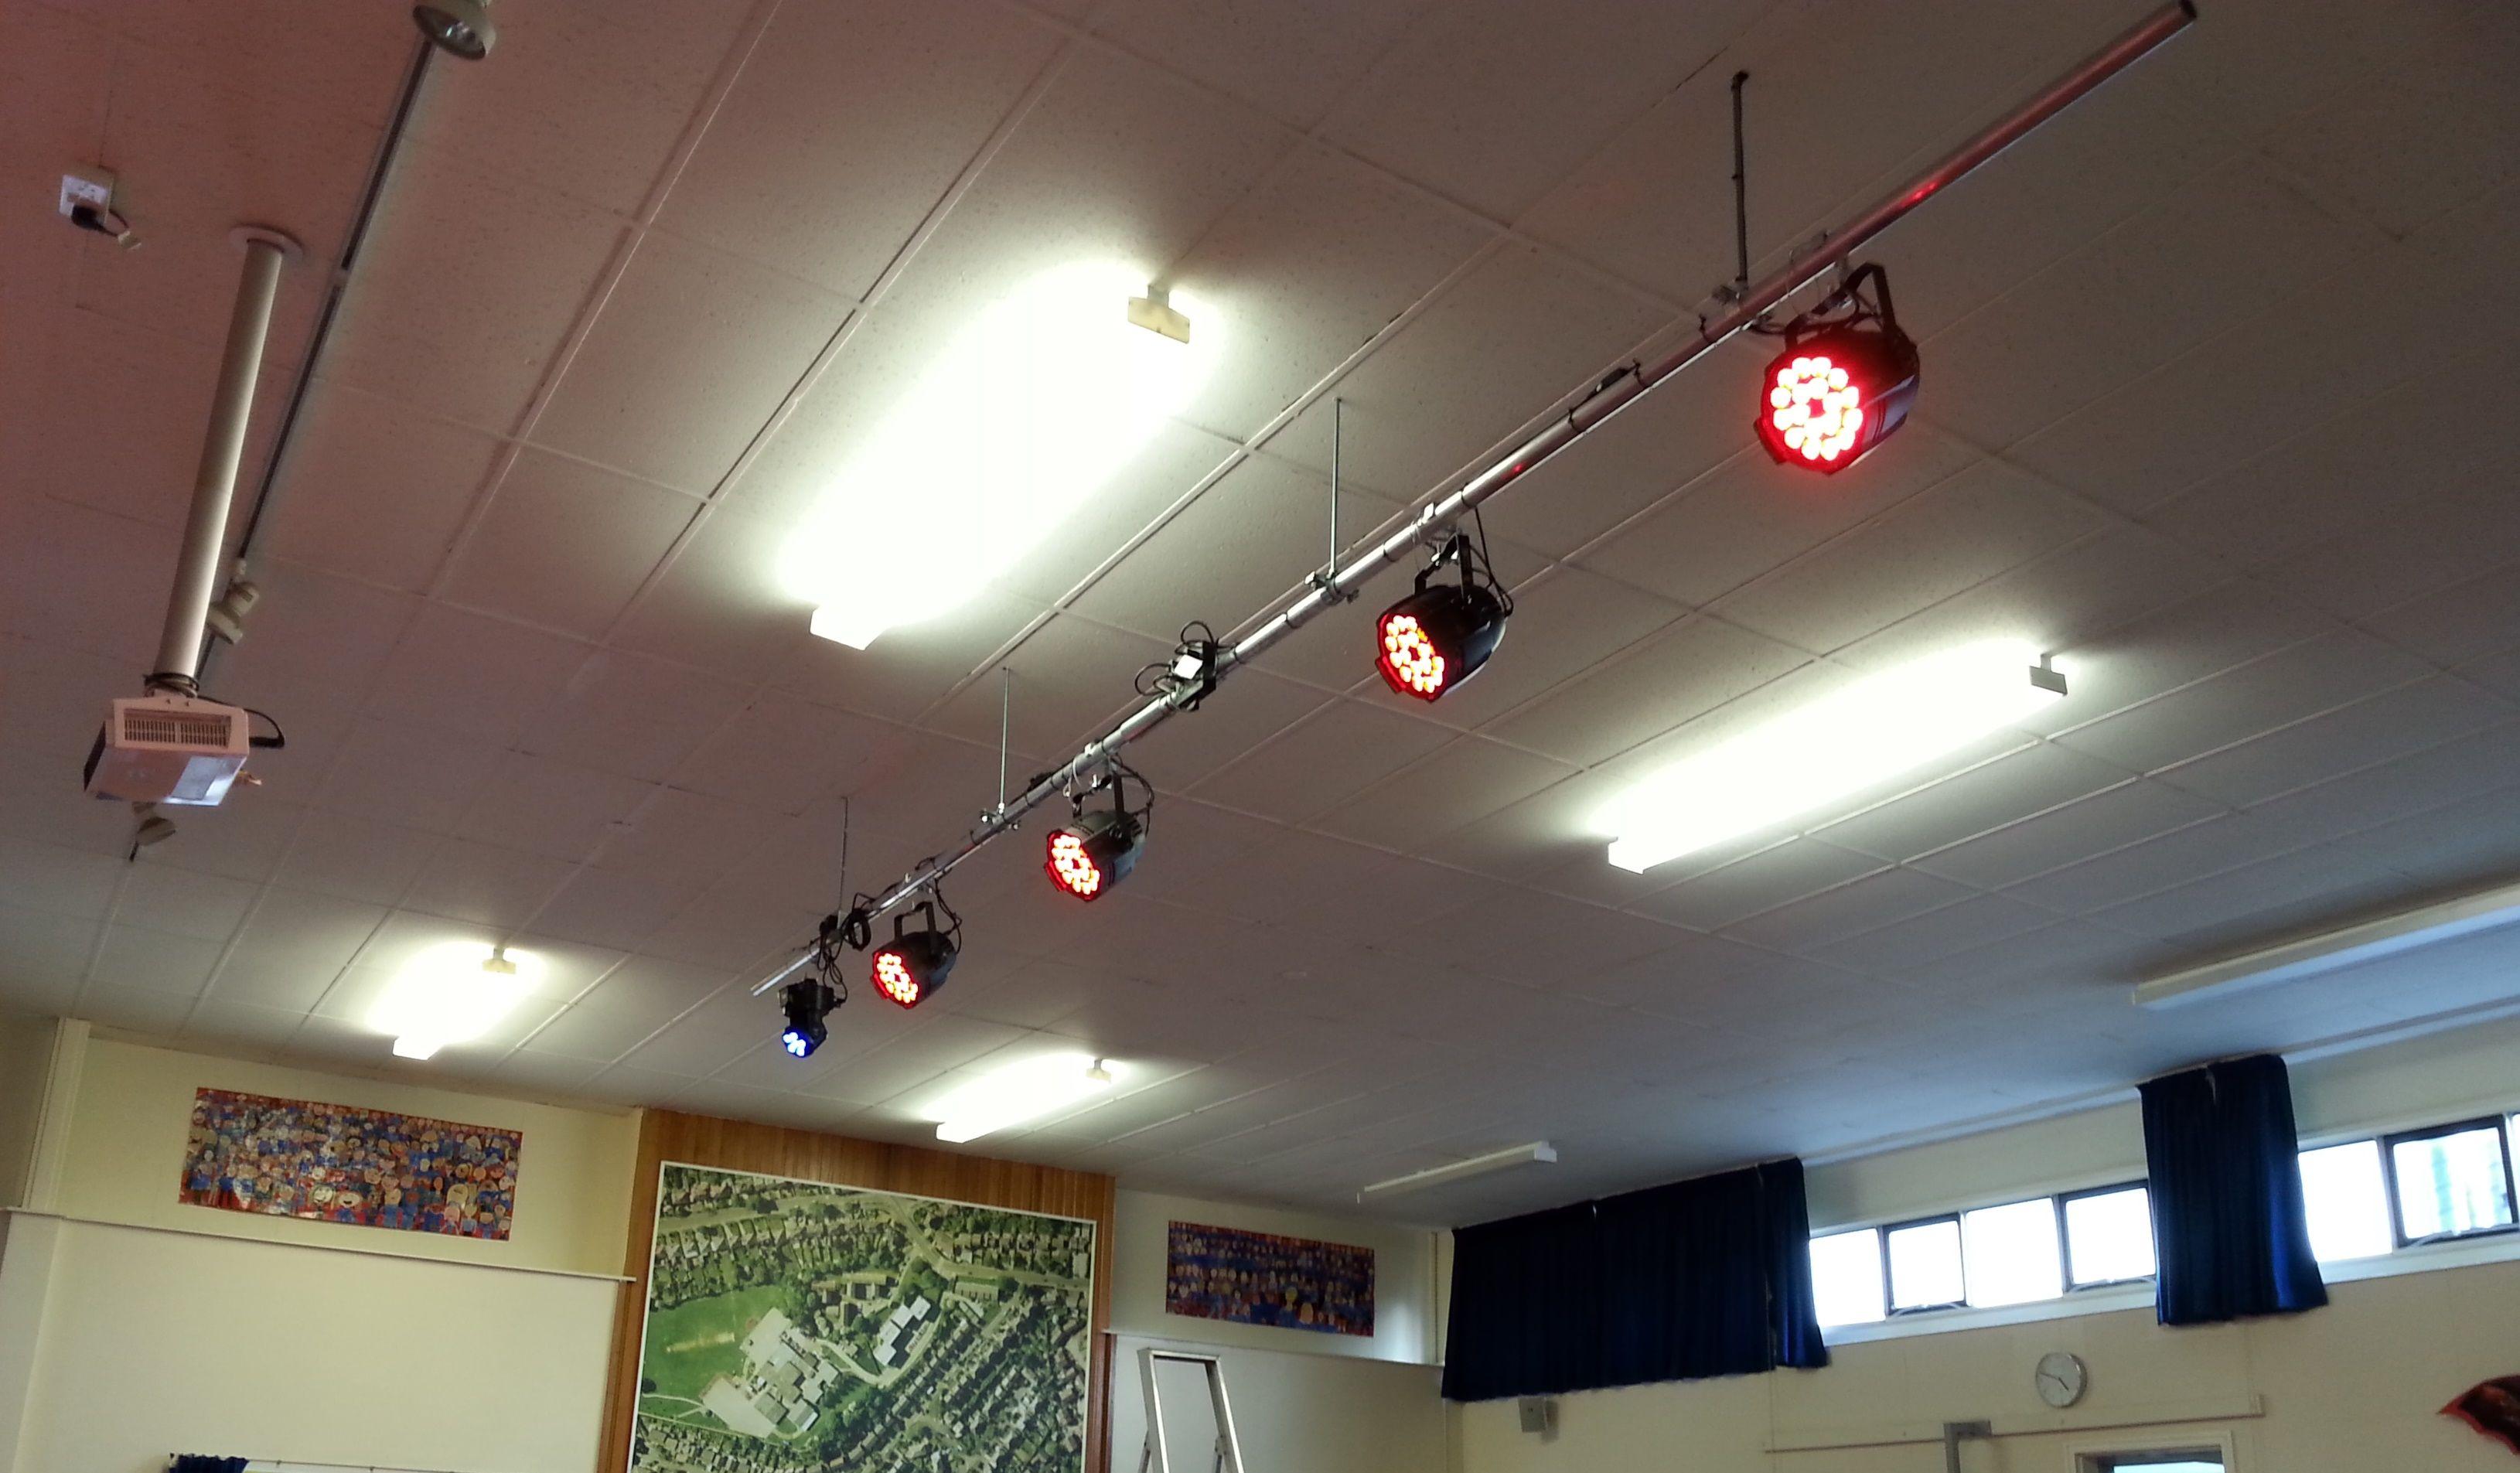 Lighting bar installation 4 x led pars and 1 x led moving head lighting bar installation 4 x led pars and 1 x led moving head aloadofball Images